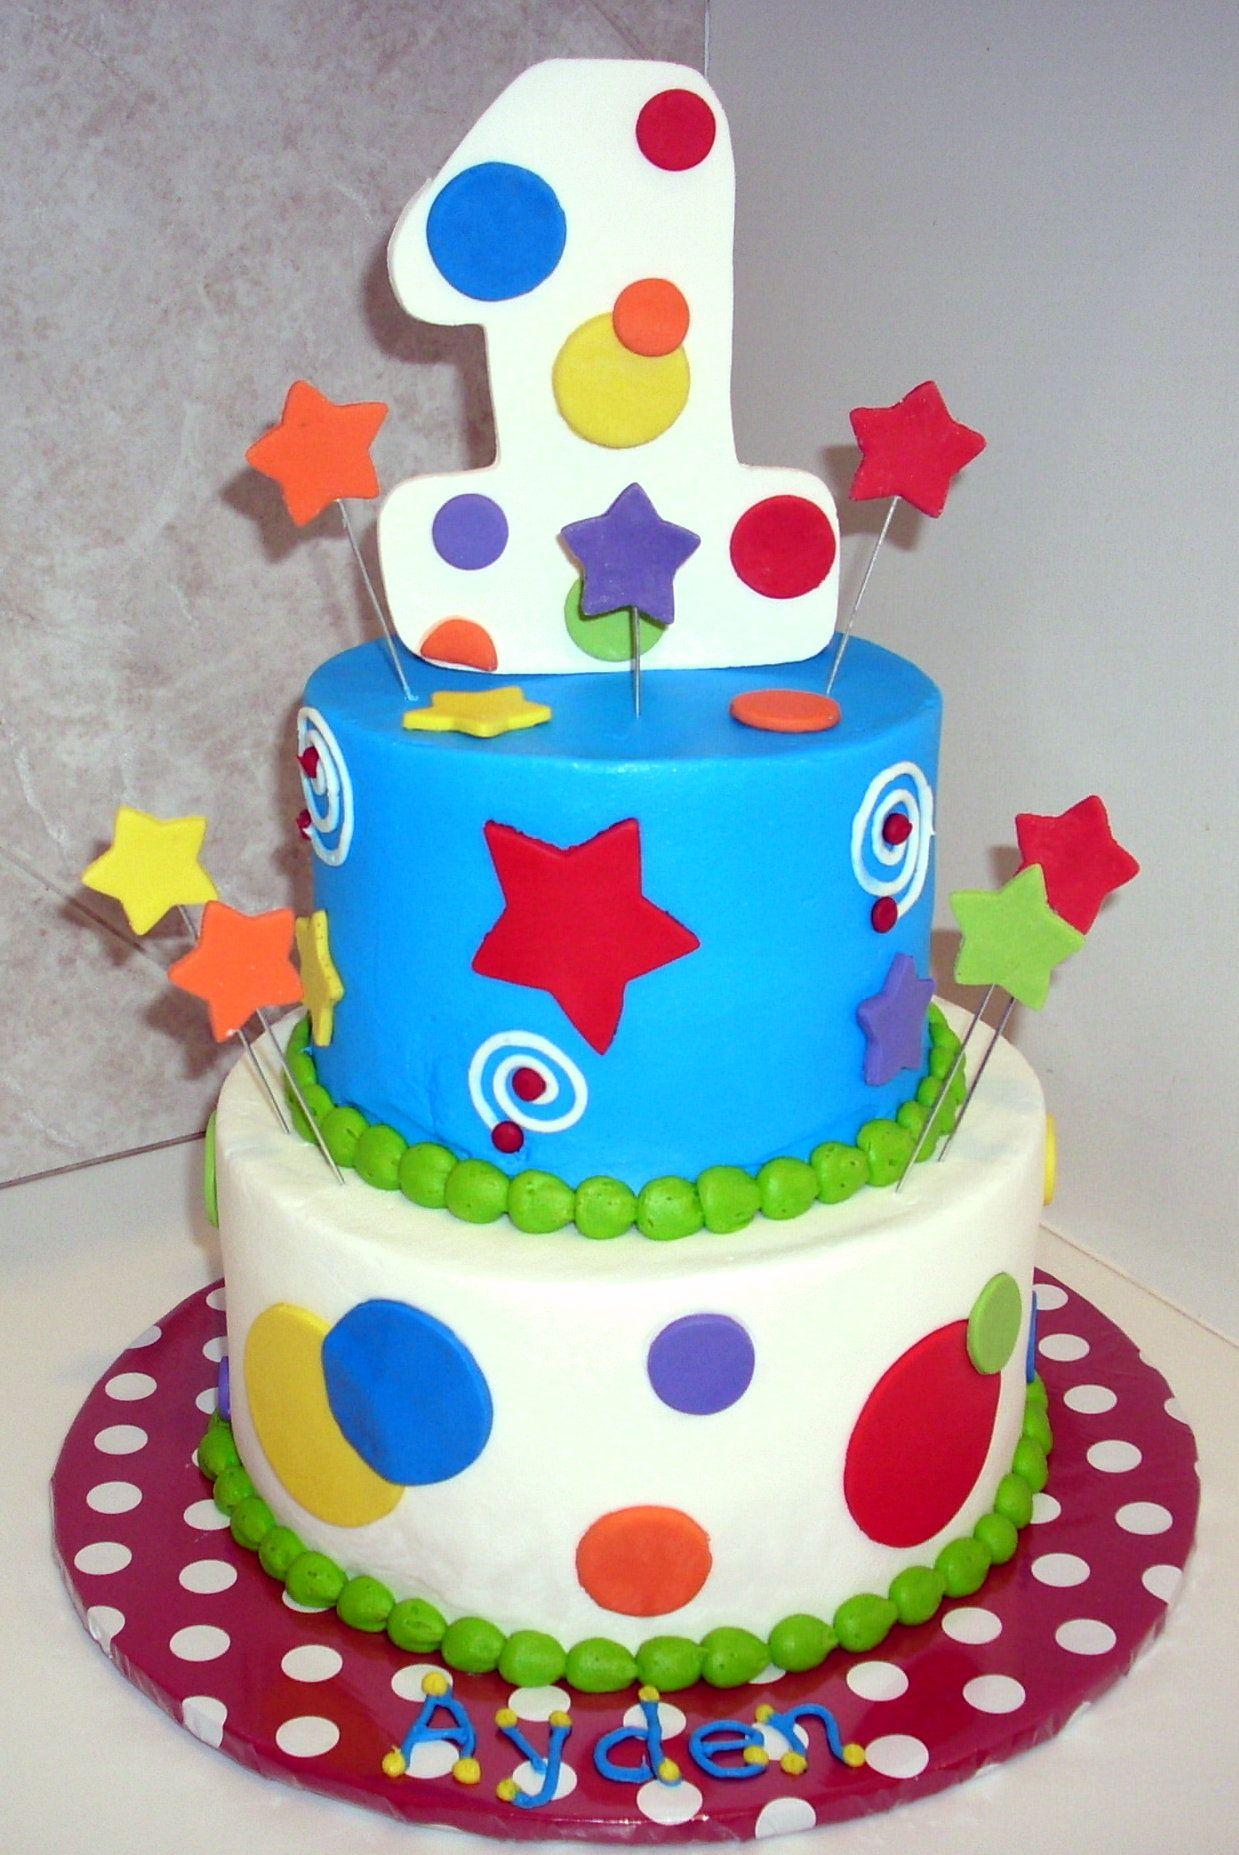 Childrens Birthday Cakes Cake Gallery Birthday Cakes